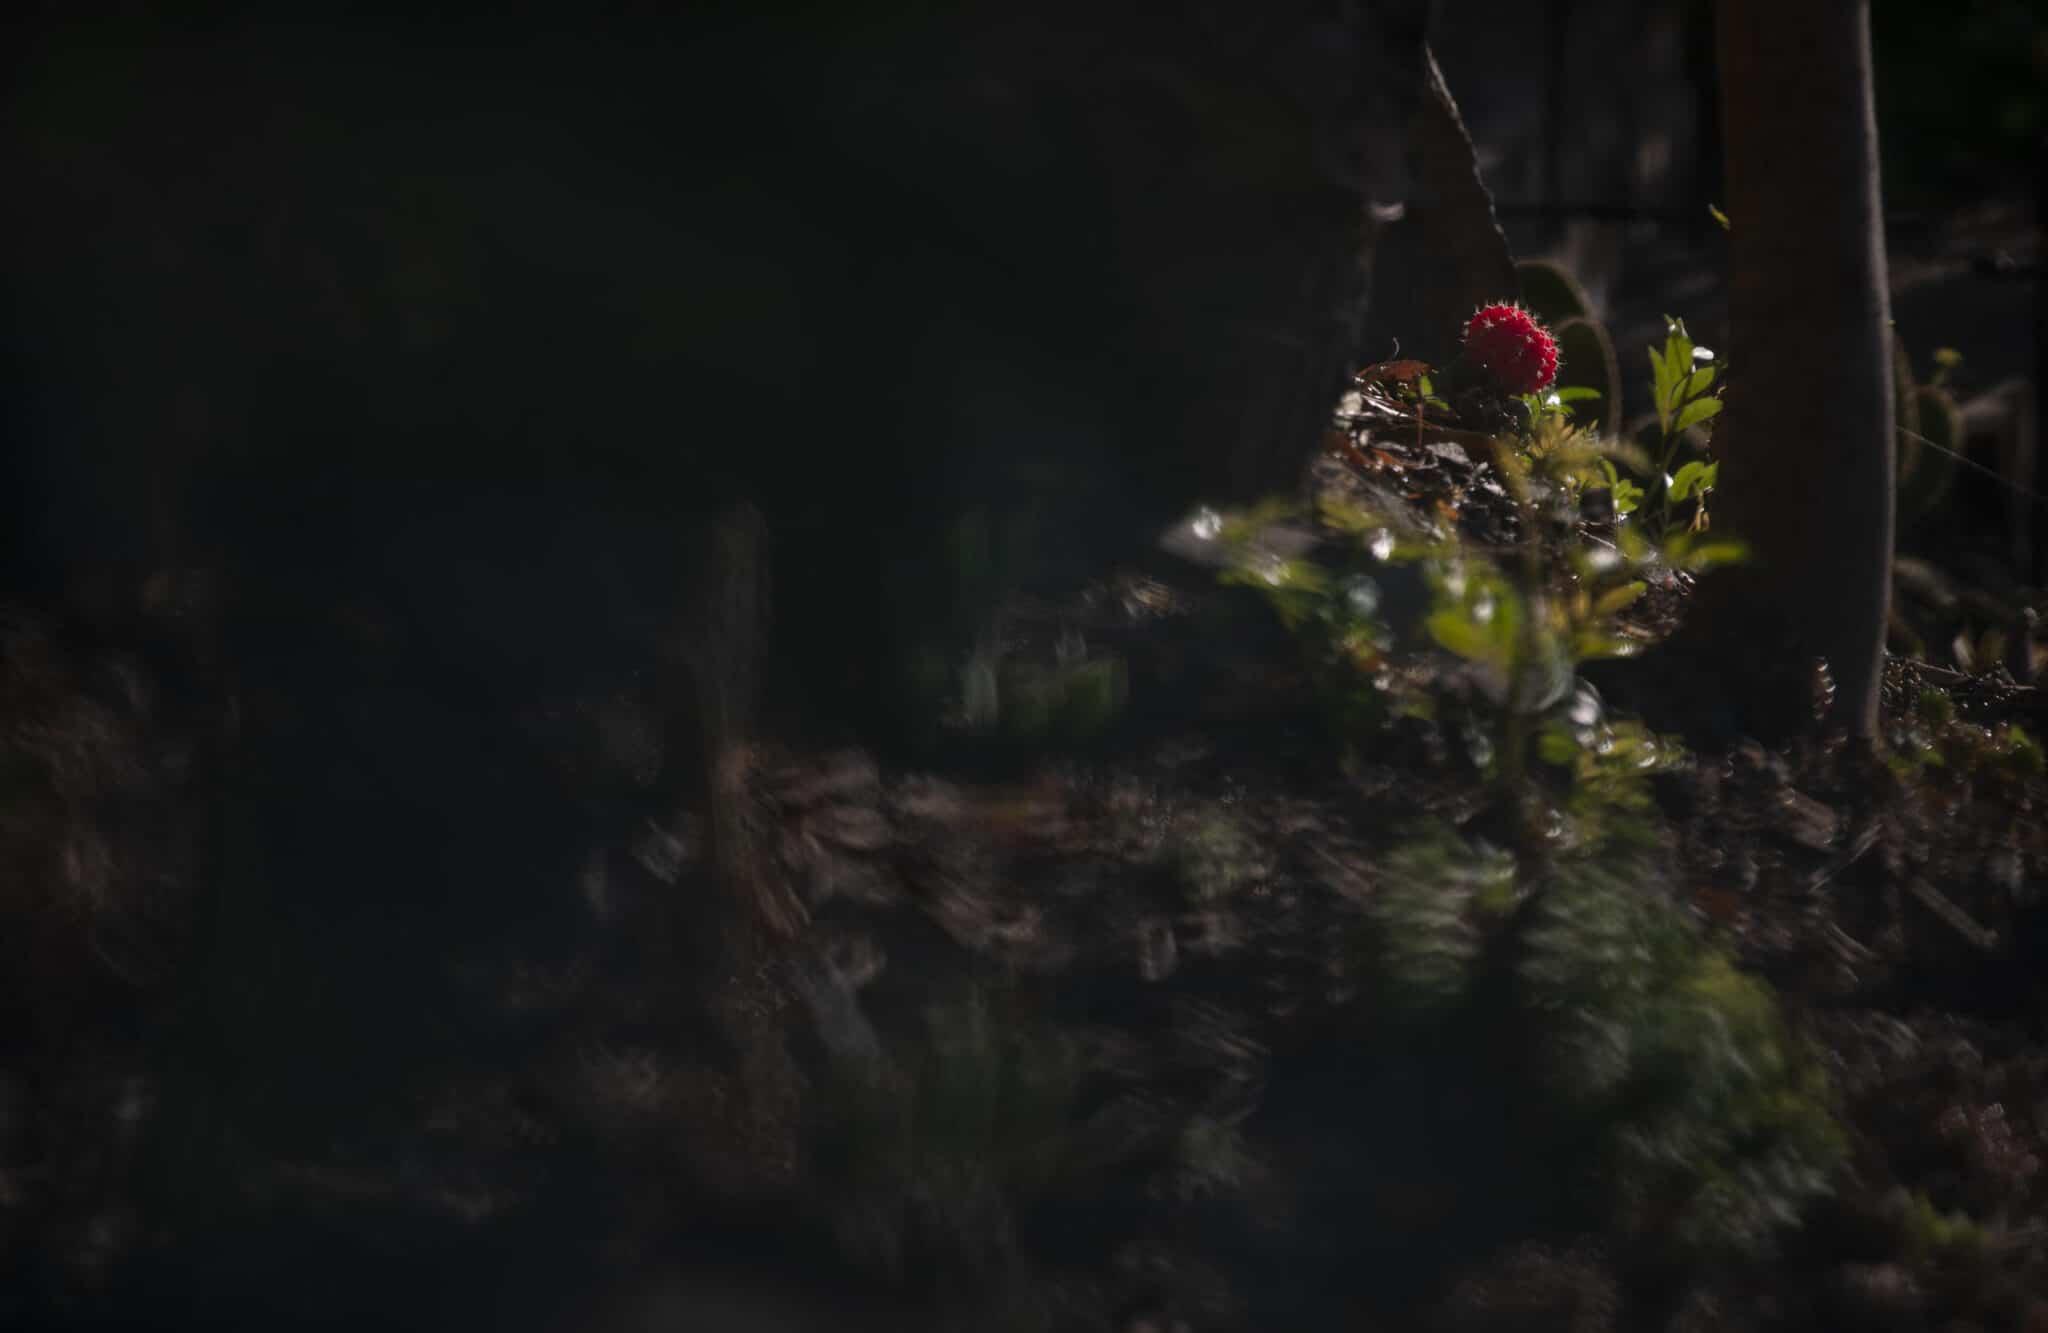 Lev L Spiro – Fugitive Light